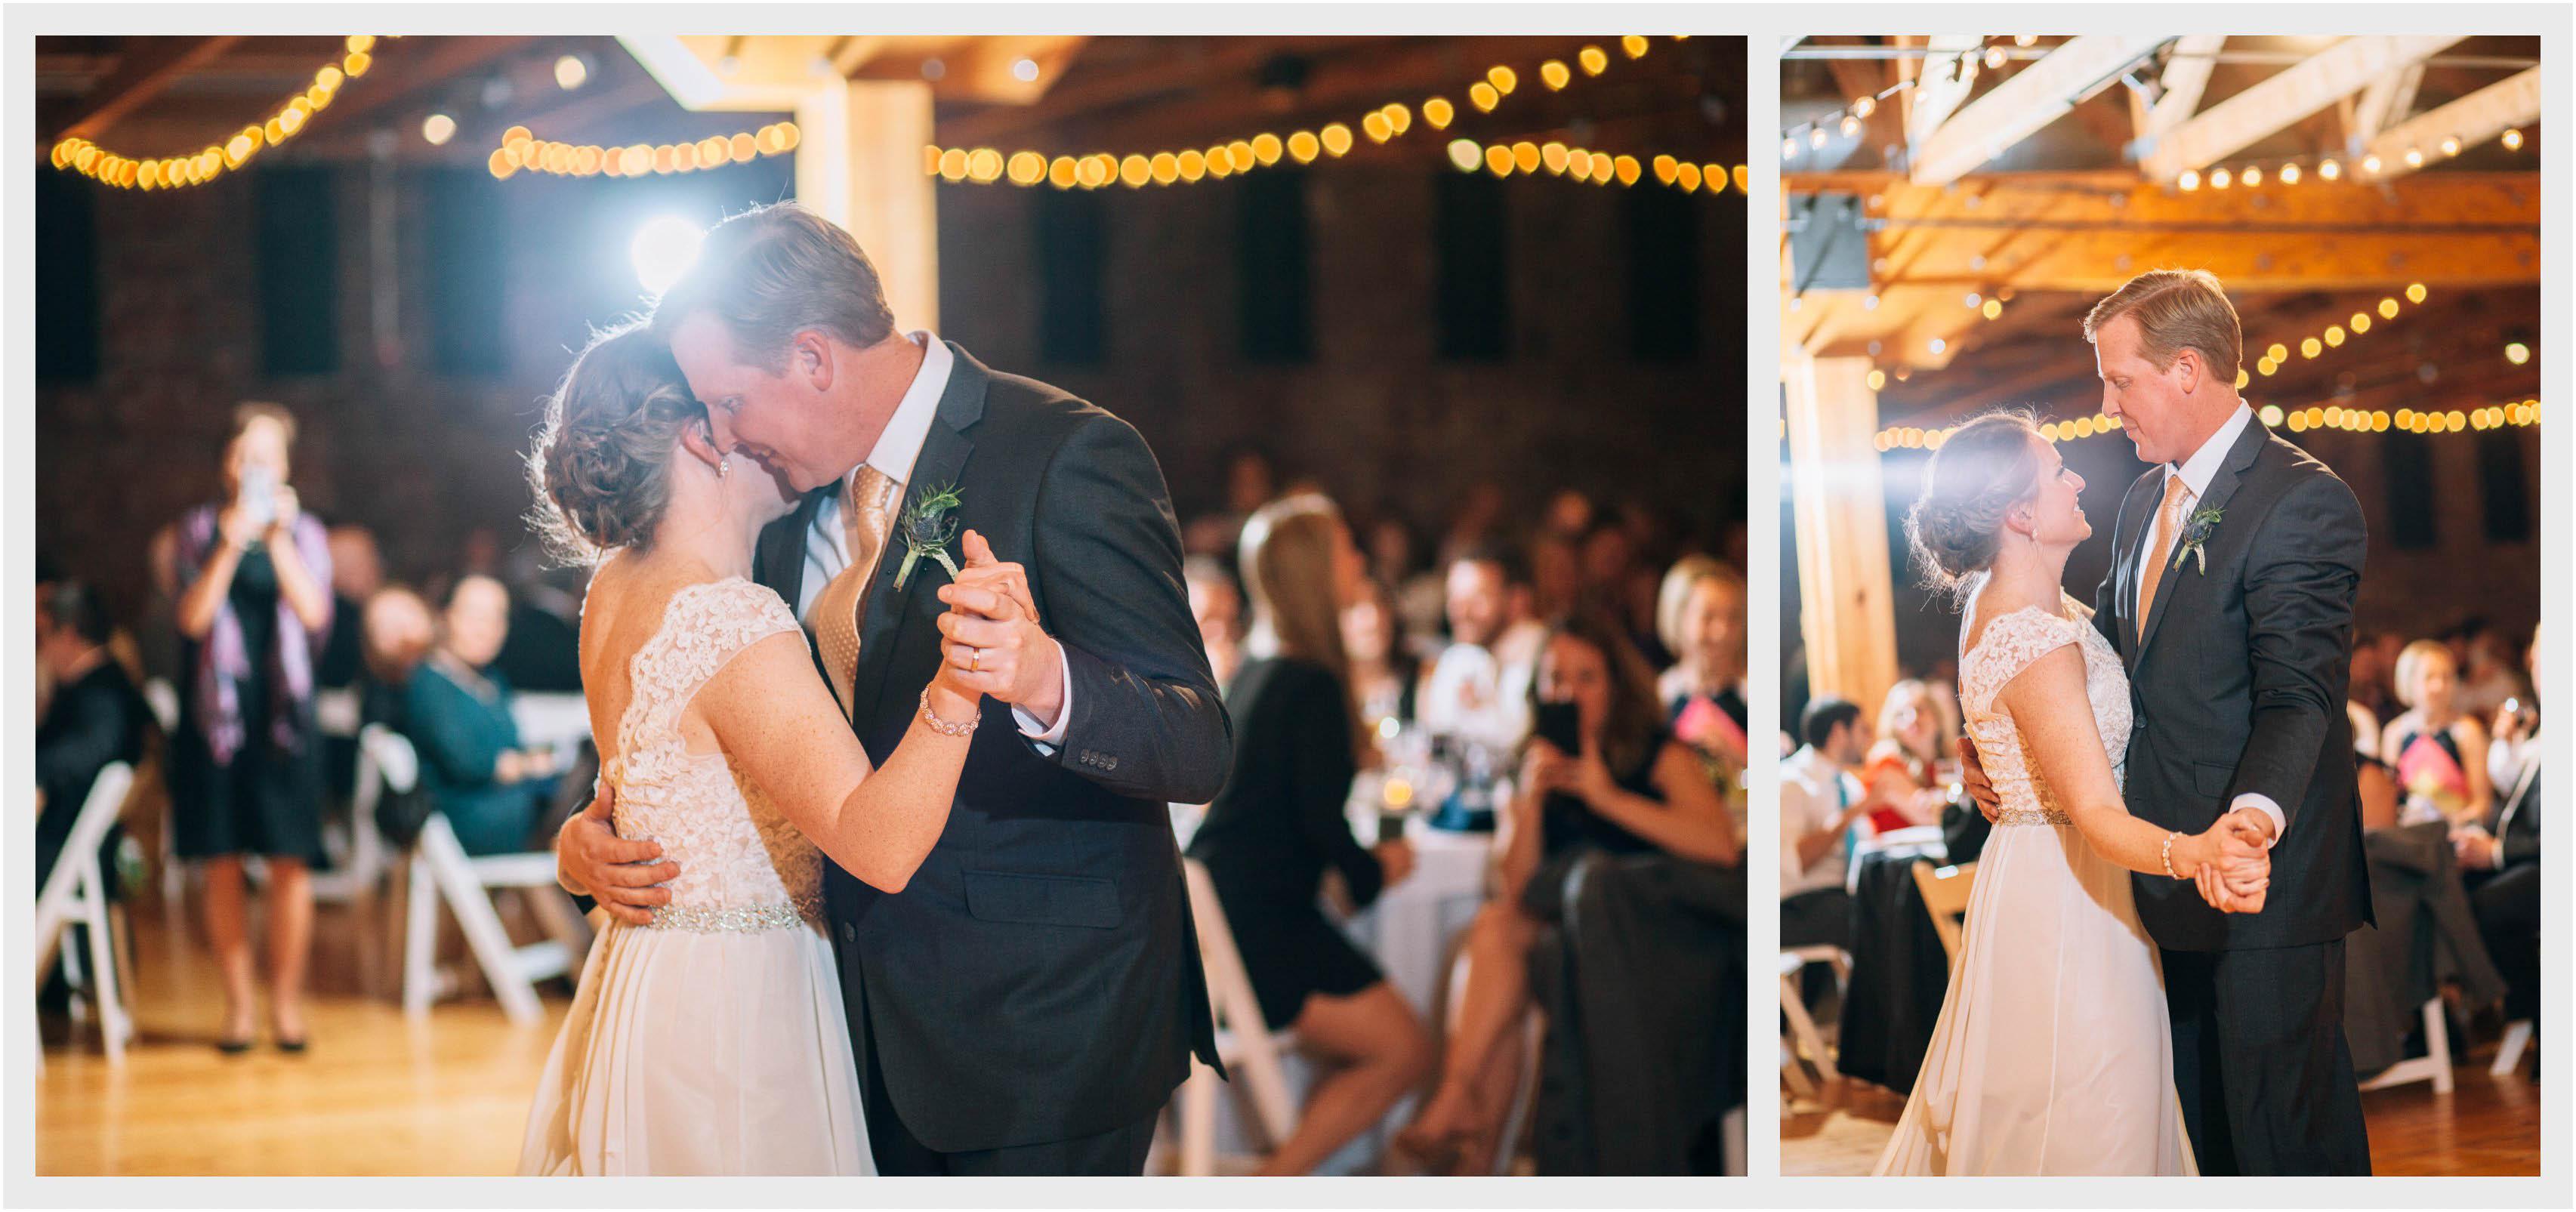 Rhinegeist wedding photos 29